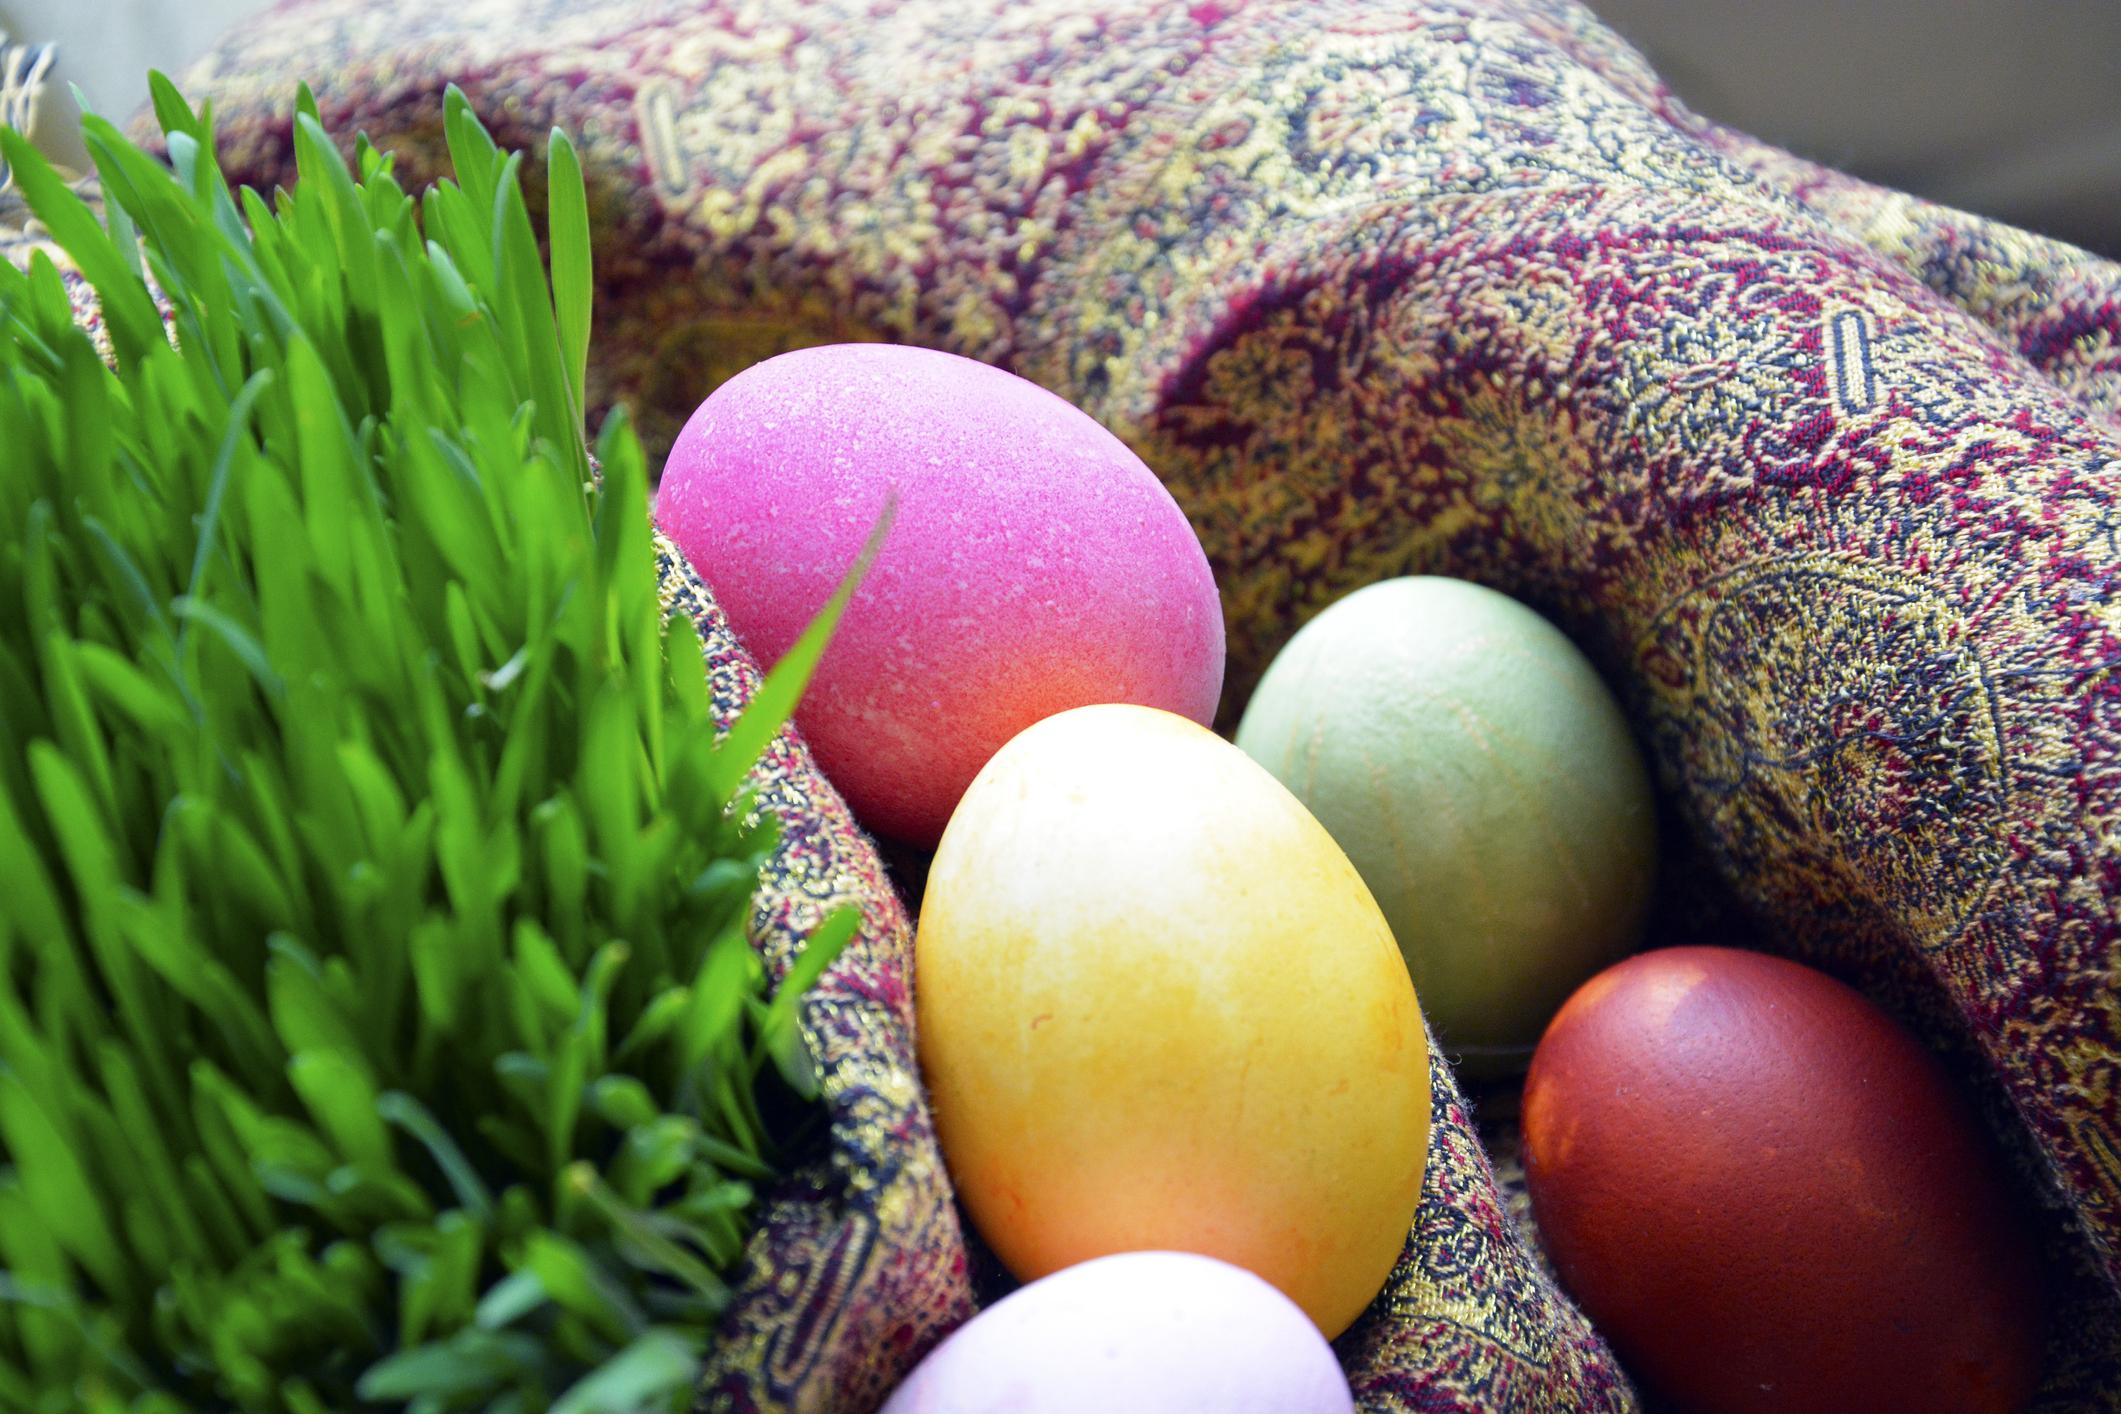 iStock-467874712_Nowruz_Eggs_Grass.jpg